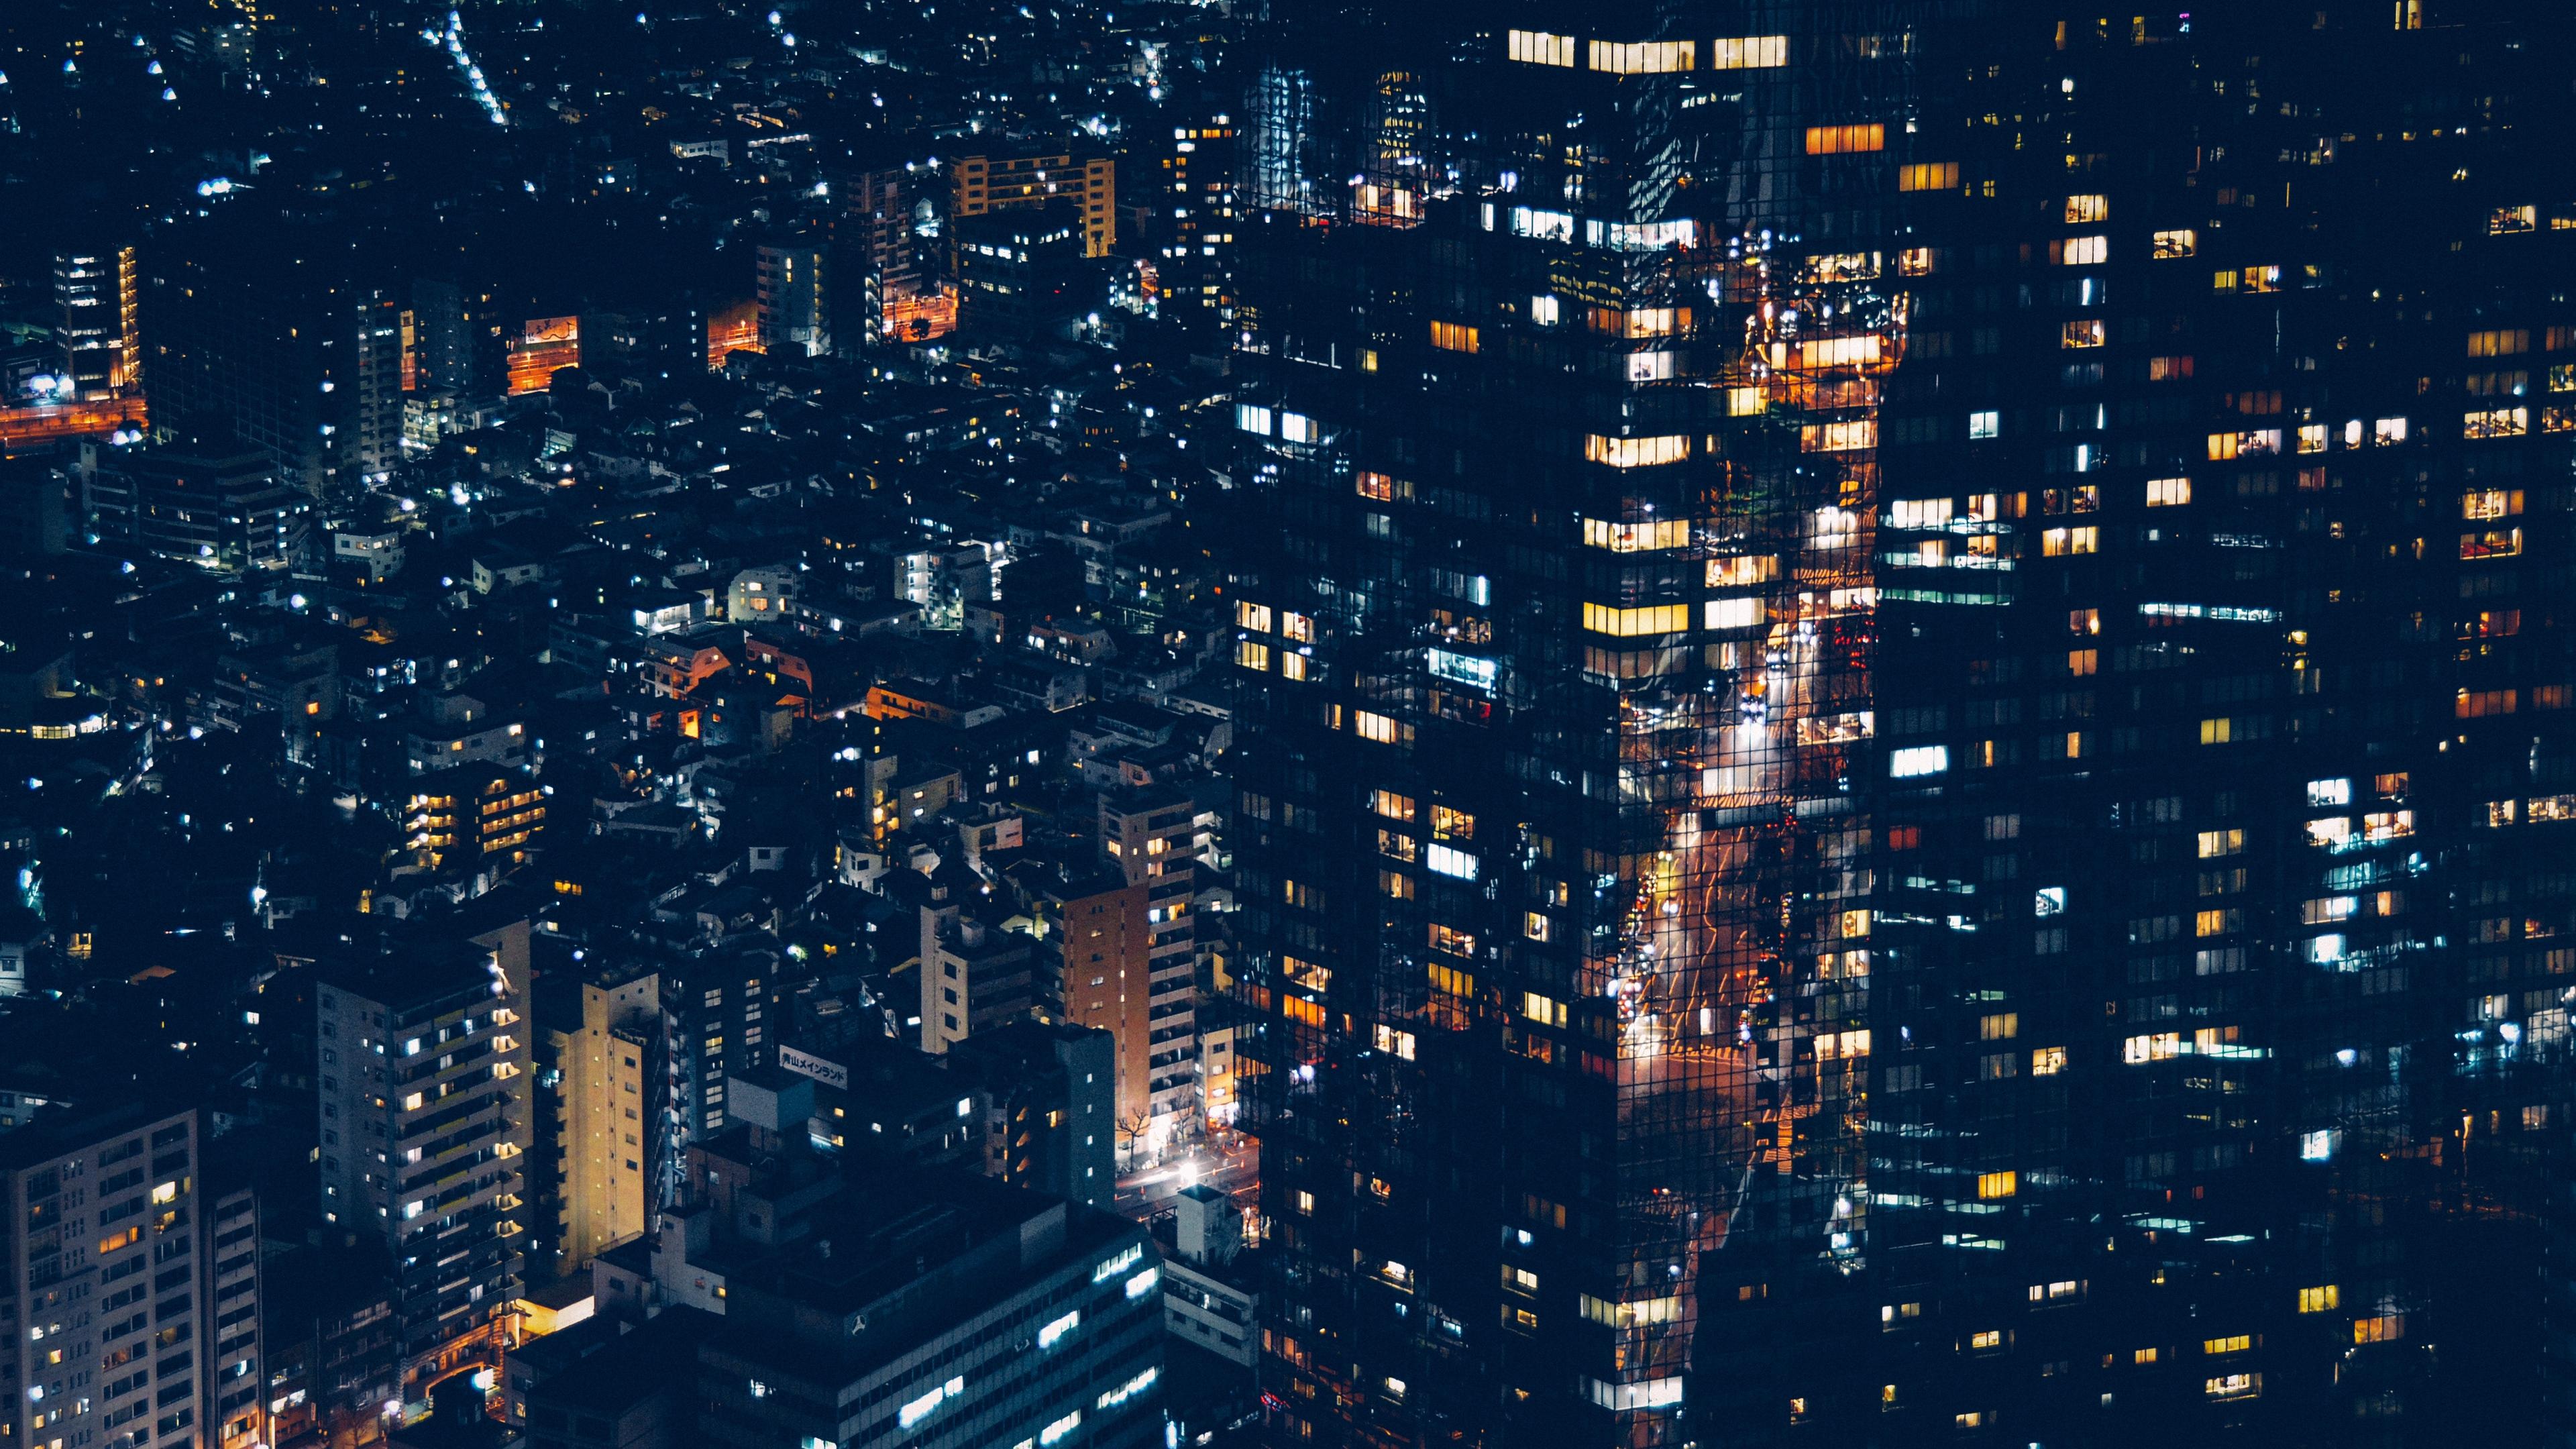 minato japan night city buildings city lights 4k 1538065146 - minato, japan, night city, buildings, city lights 4k - night city, minato, Japan